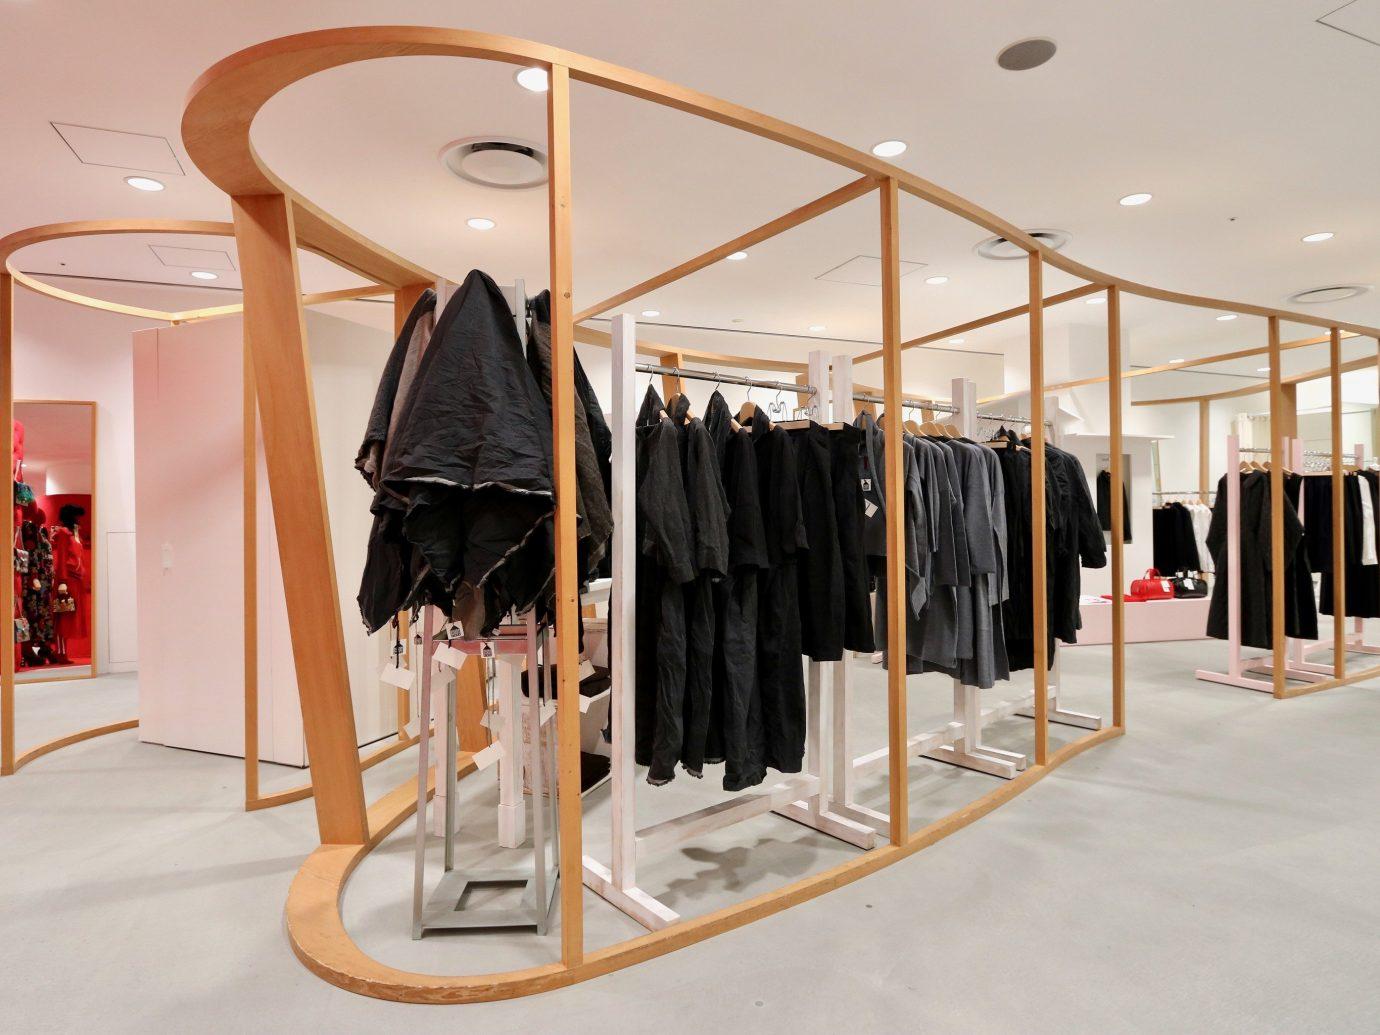 shopping Style + Design Travel Trends Trip Ideas indoor Boutique exhibition interior design product design clothes hanger furniture retail flooring product